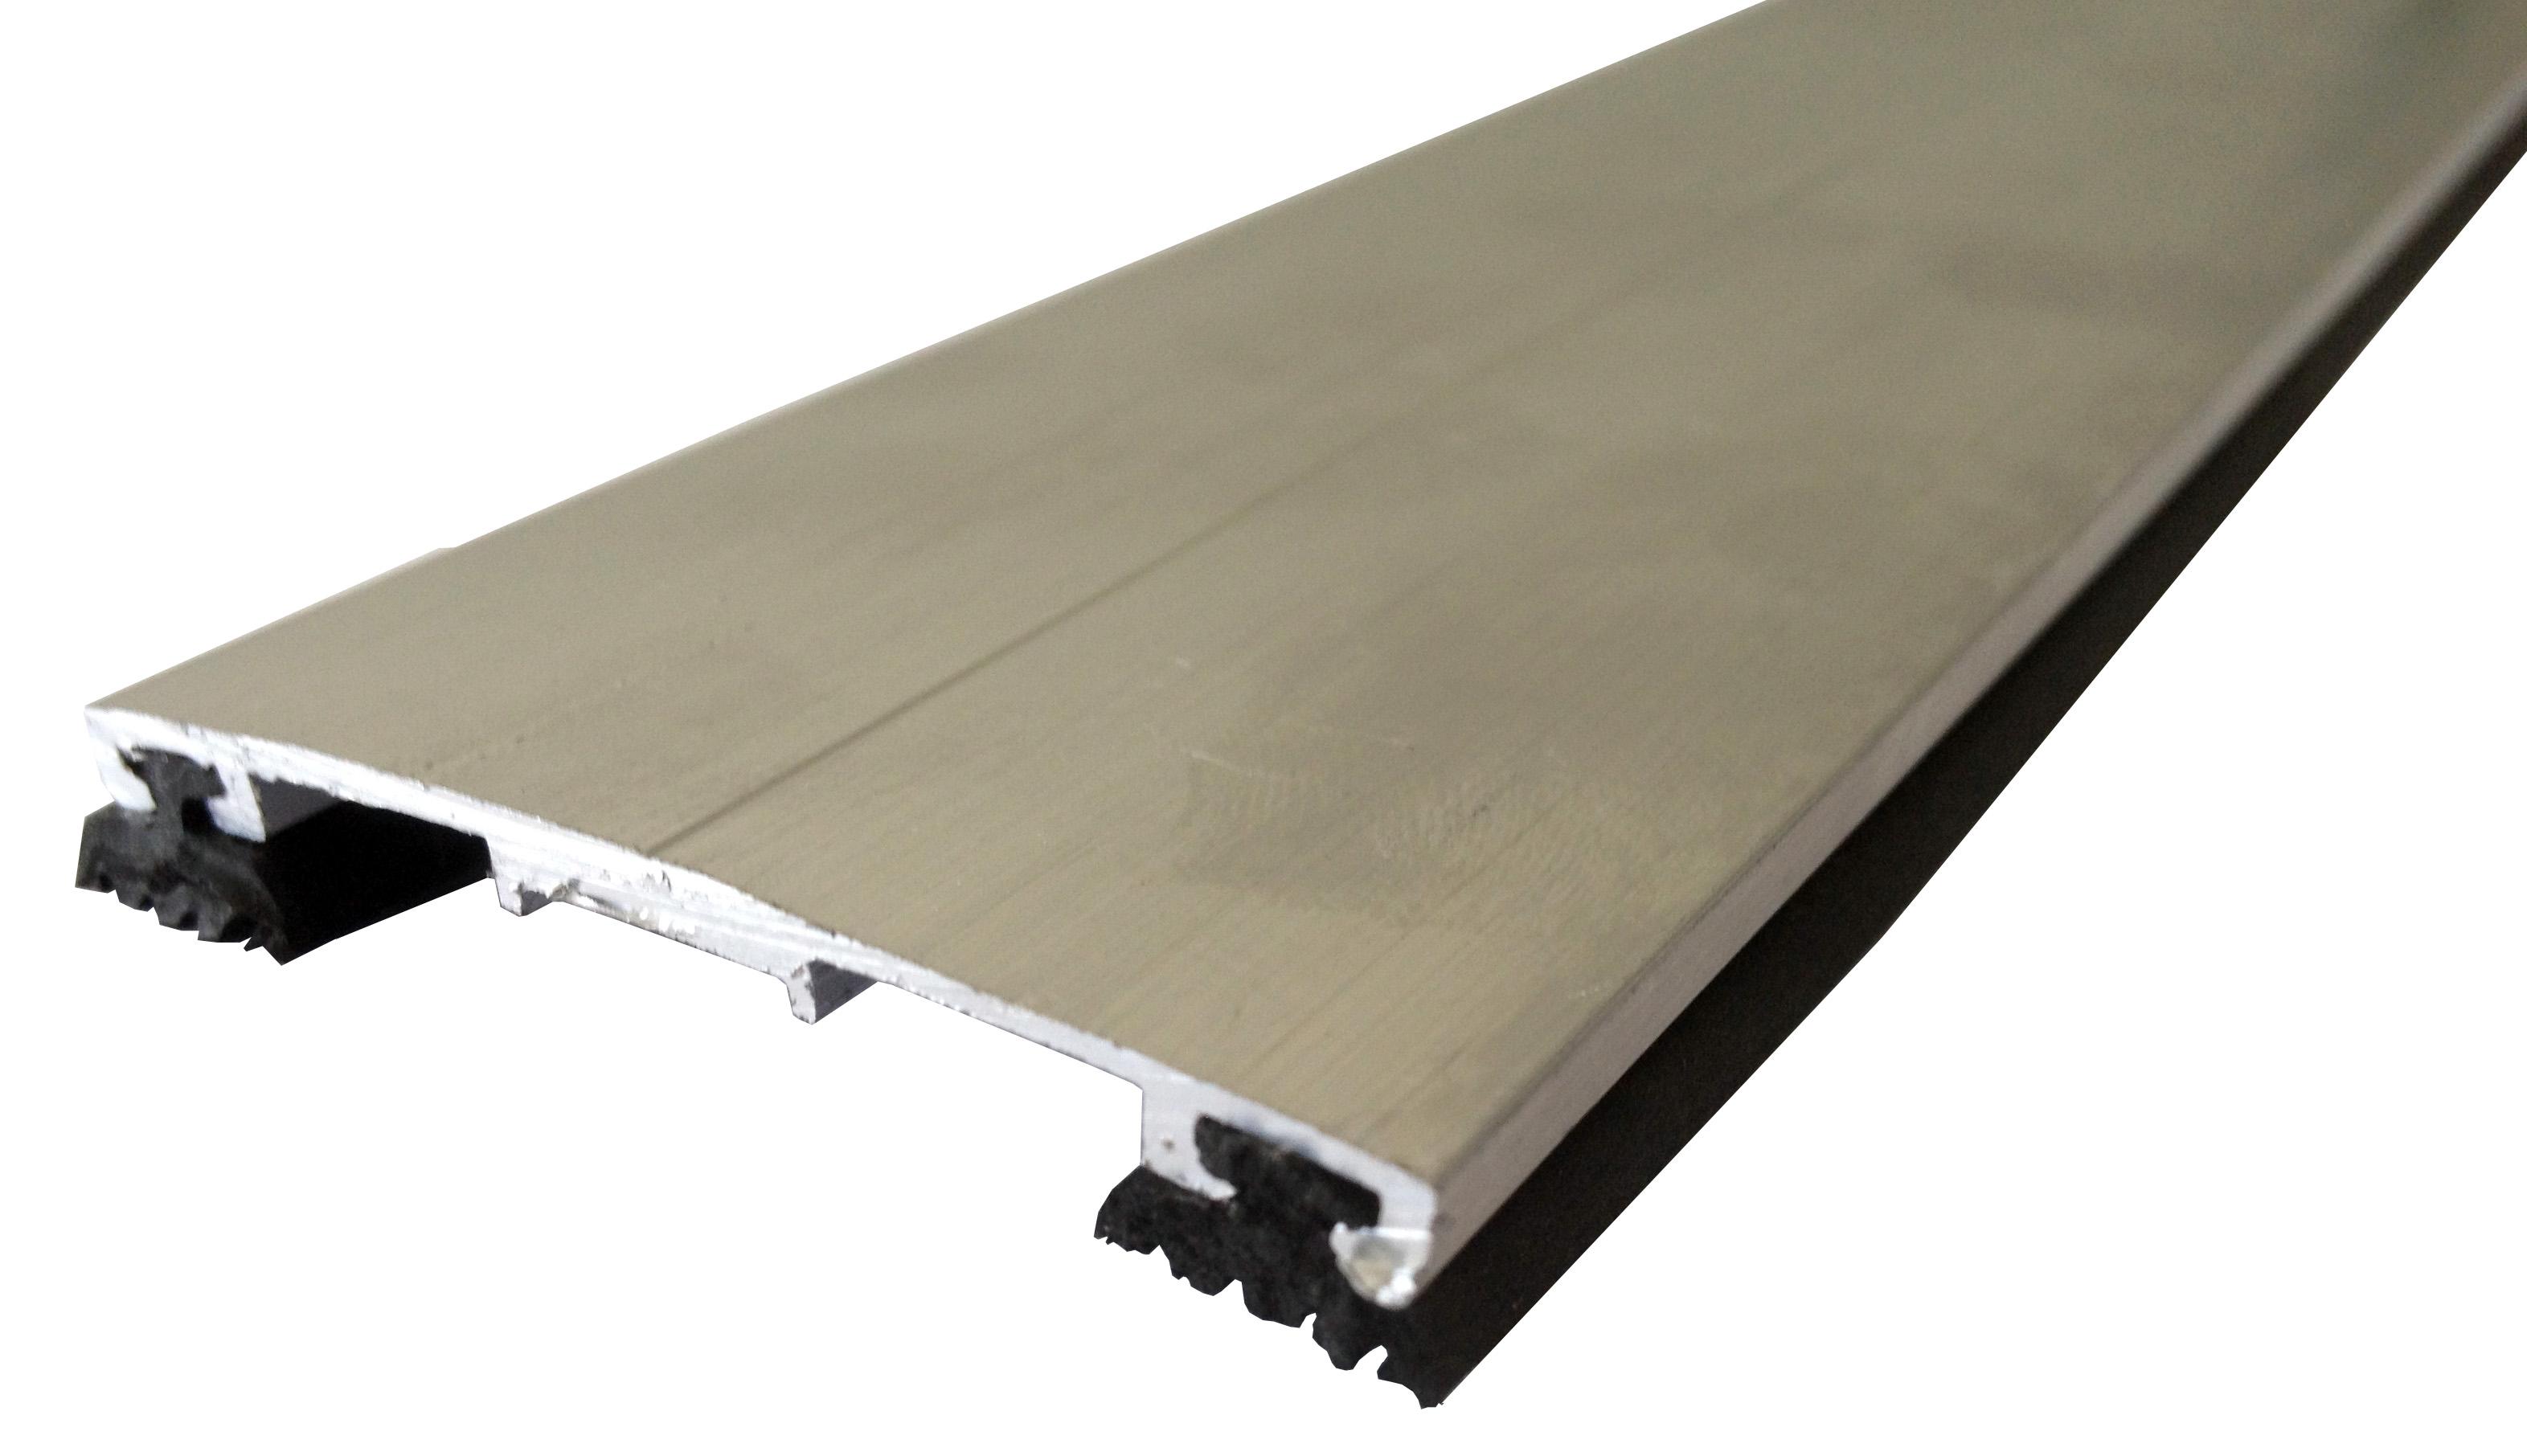 Perfis e acess rios em policarbonato e aluminio polysolution for Materiales para toldos de aluminio